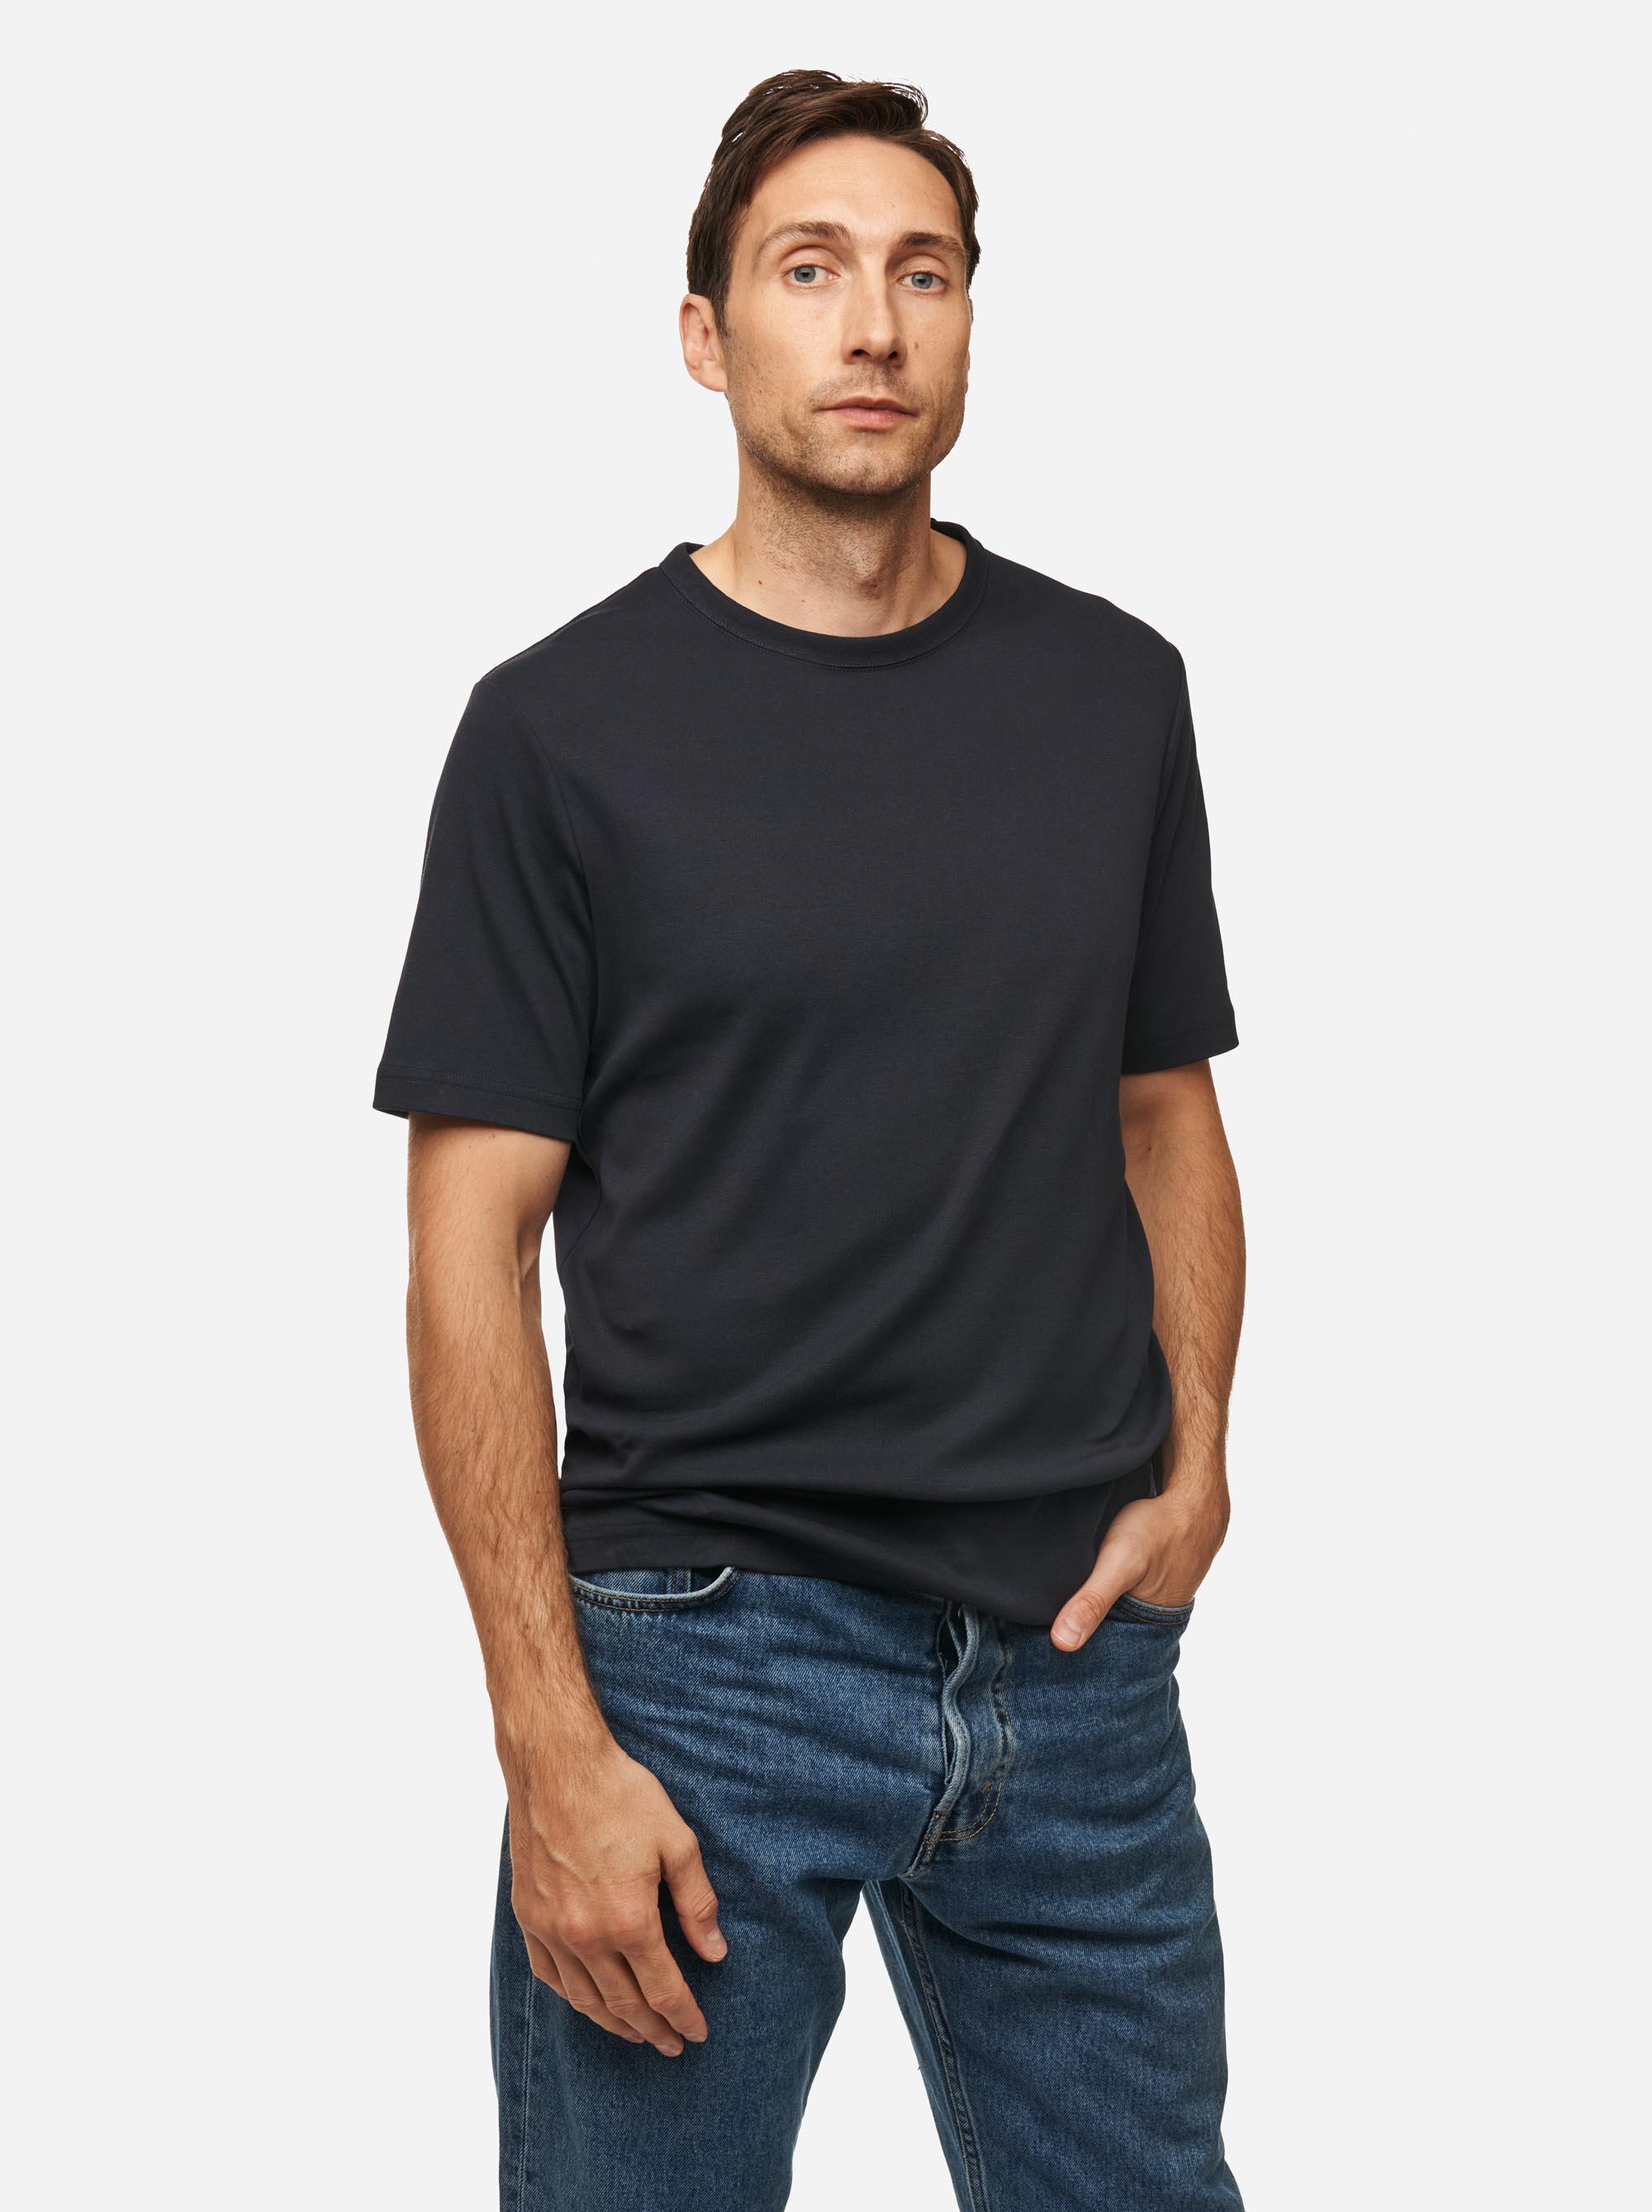 Teym - The T-Shirt - Men - Blue - 2